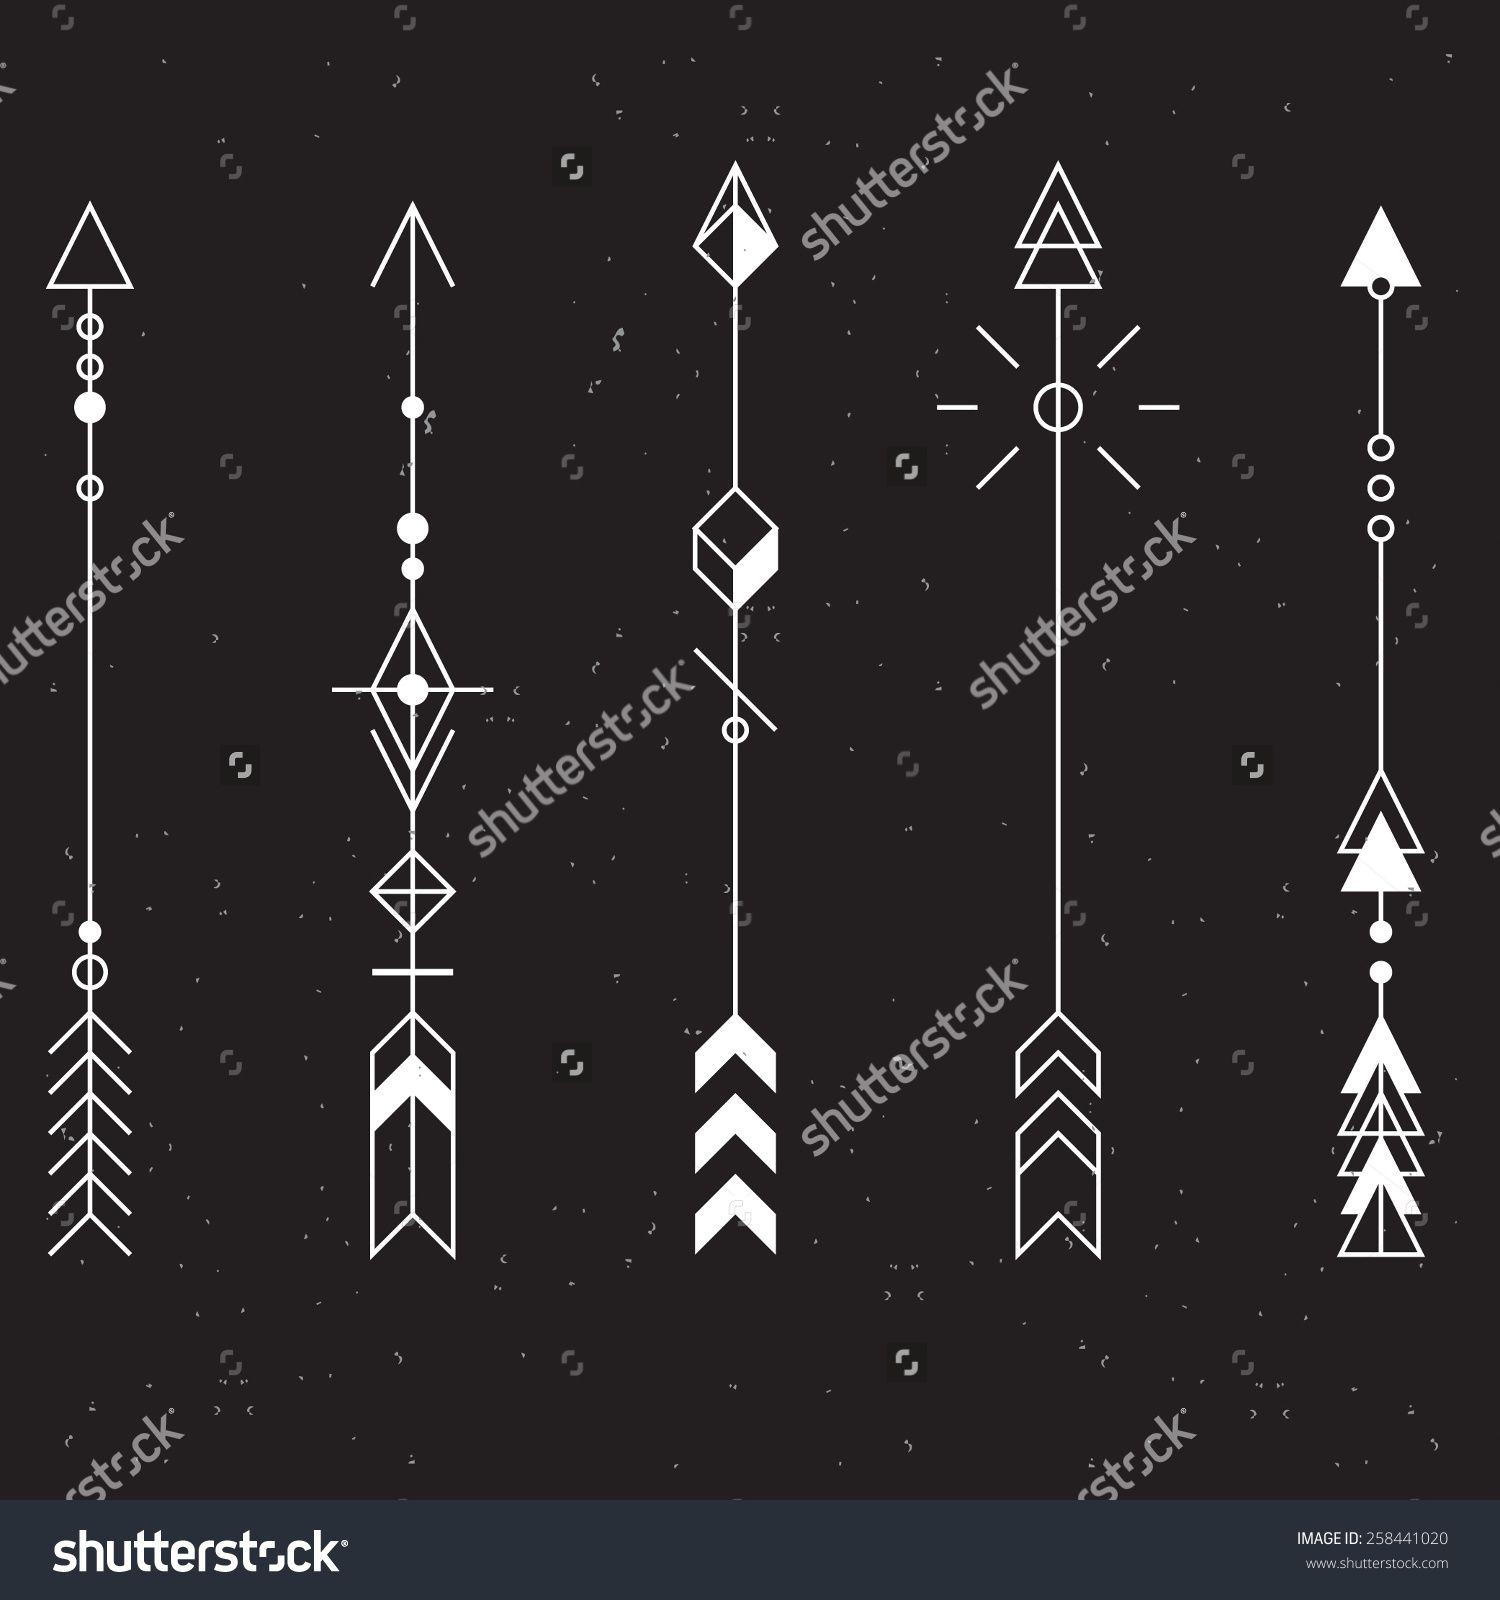 5897c6dcfe164 Arrow Tattoo Stock Vectors & Vector Clip Art | Shutterstock More